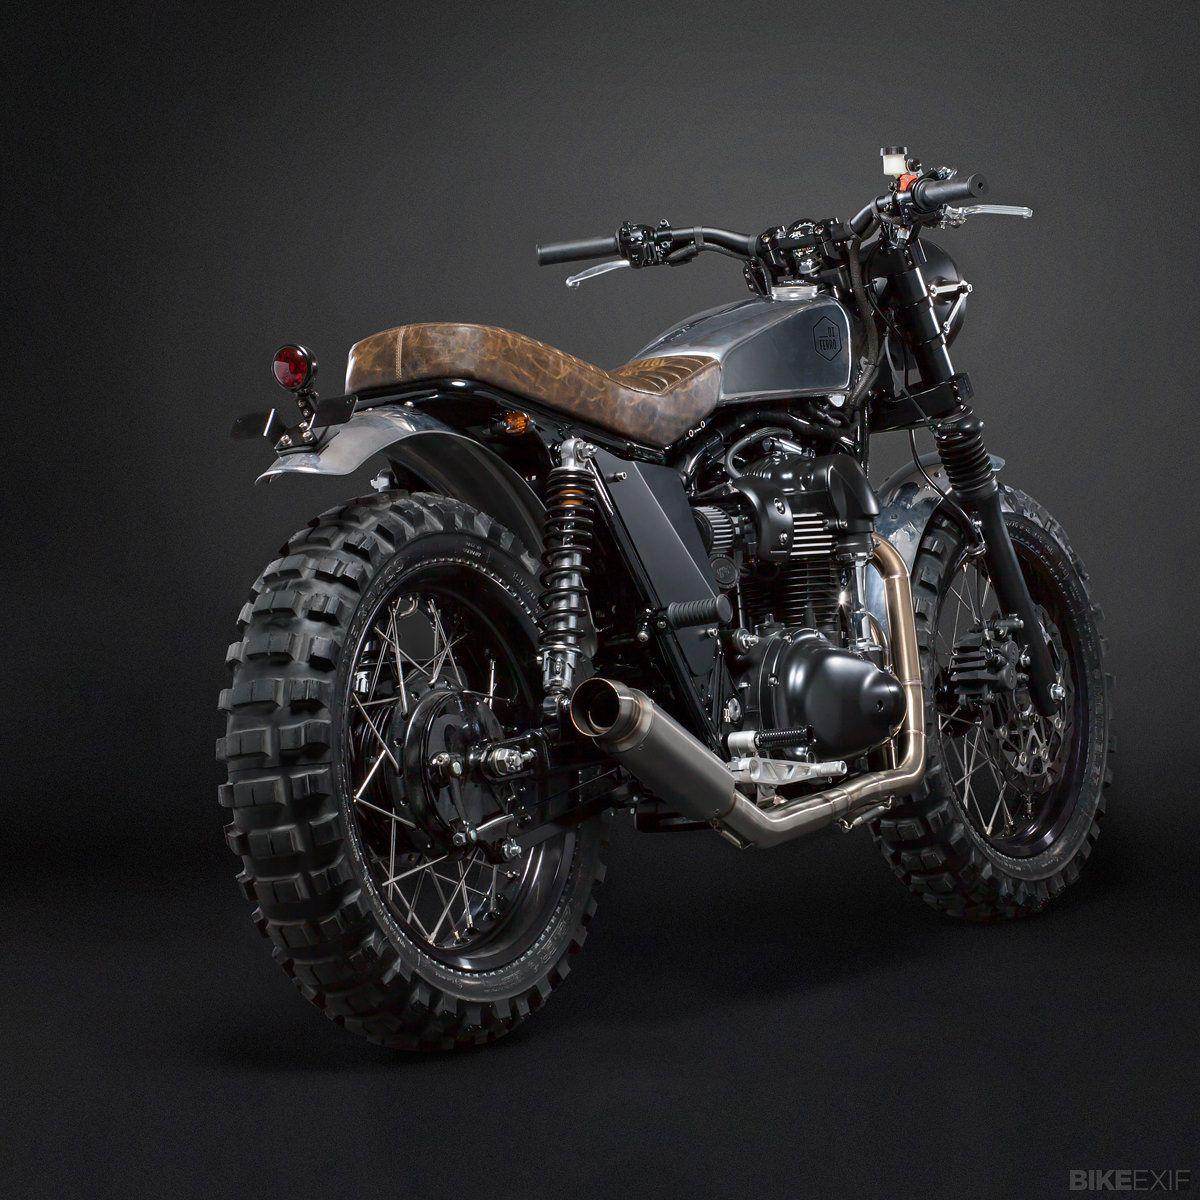 The Kawasaki W800 Gets A Makeover From Italian Custom Workshop Moto Di Ferro Take Your